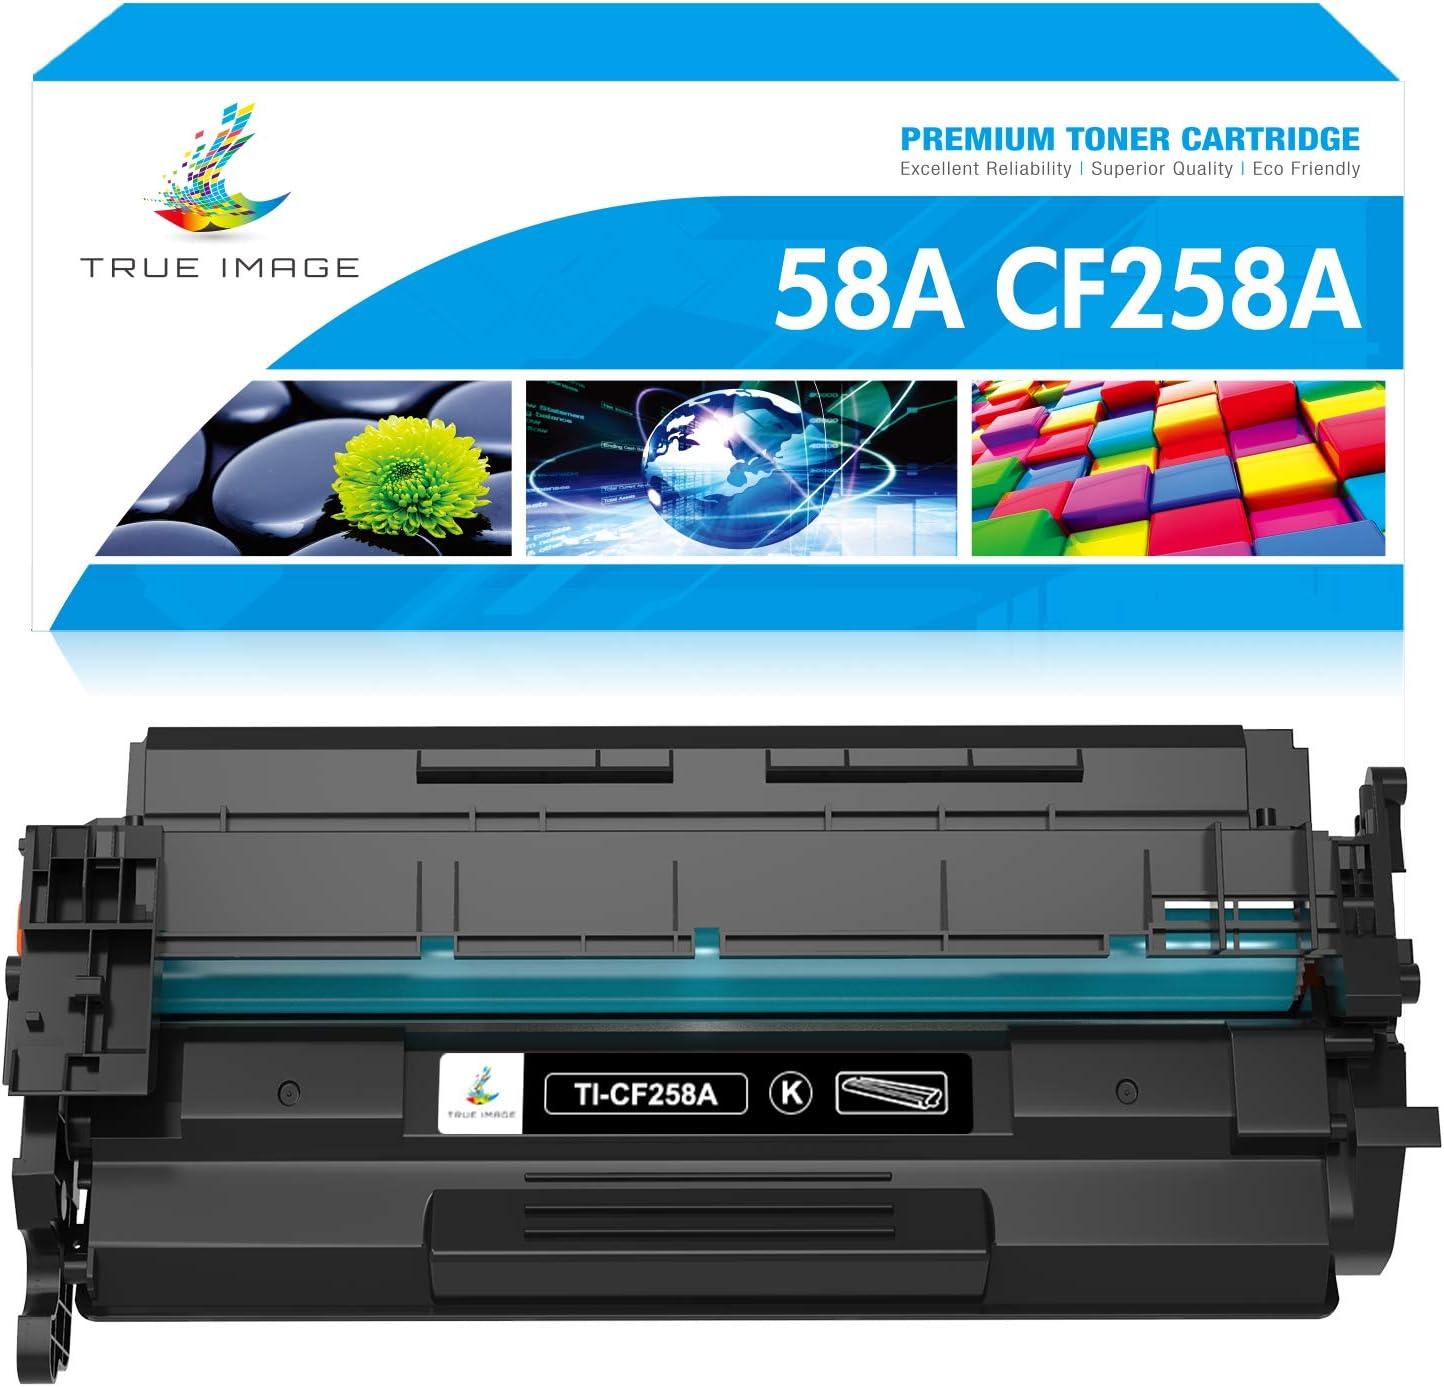 True Image Compatible Toner Cartridge Replacement for HP 58A CF258A CF258X 58X HP Laserjet Pro MFP M428fdw M404dn M404n M404dw M428fdn M428dw M404 M428 Printer Ink (Black, 1-Pack)